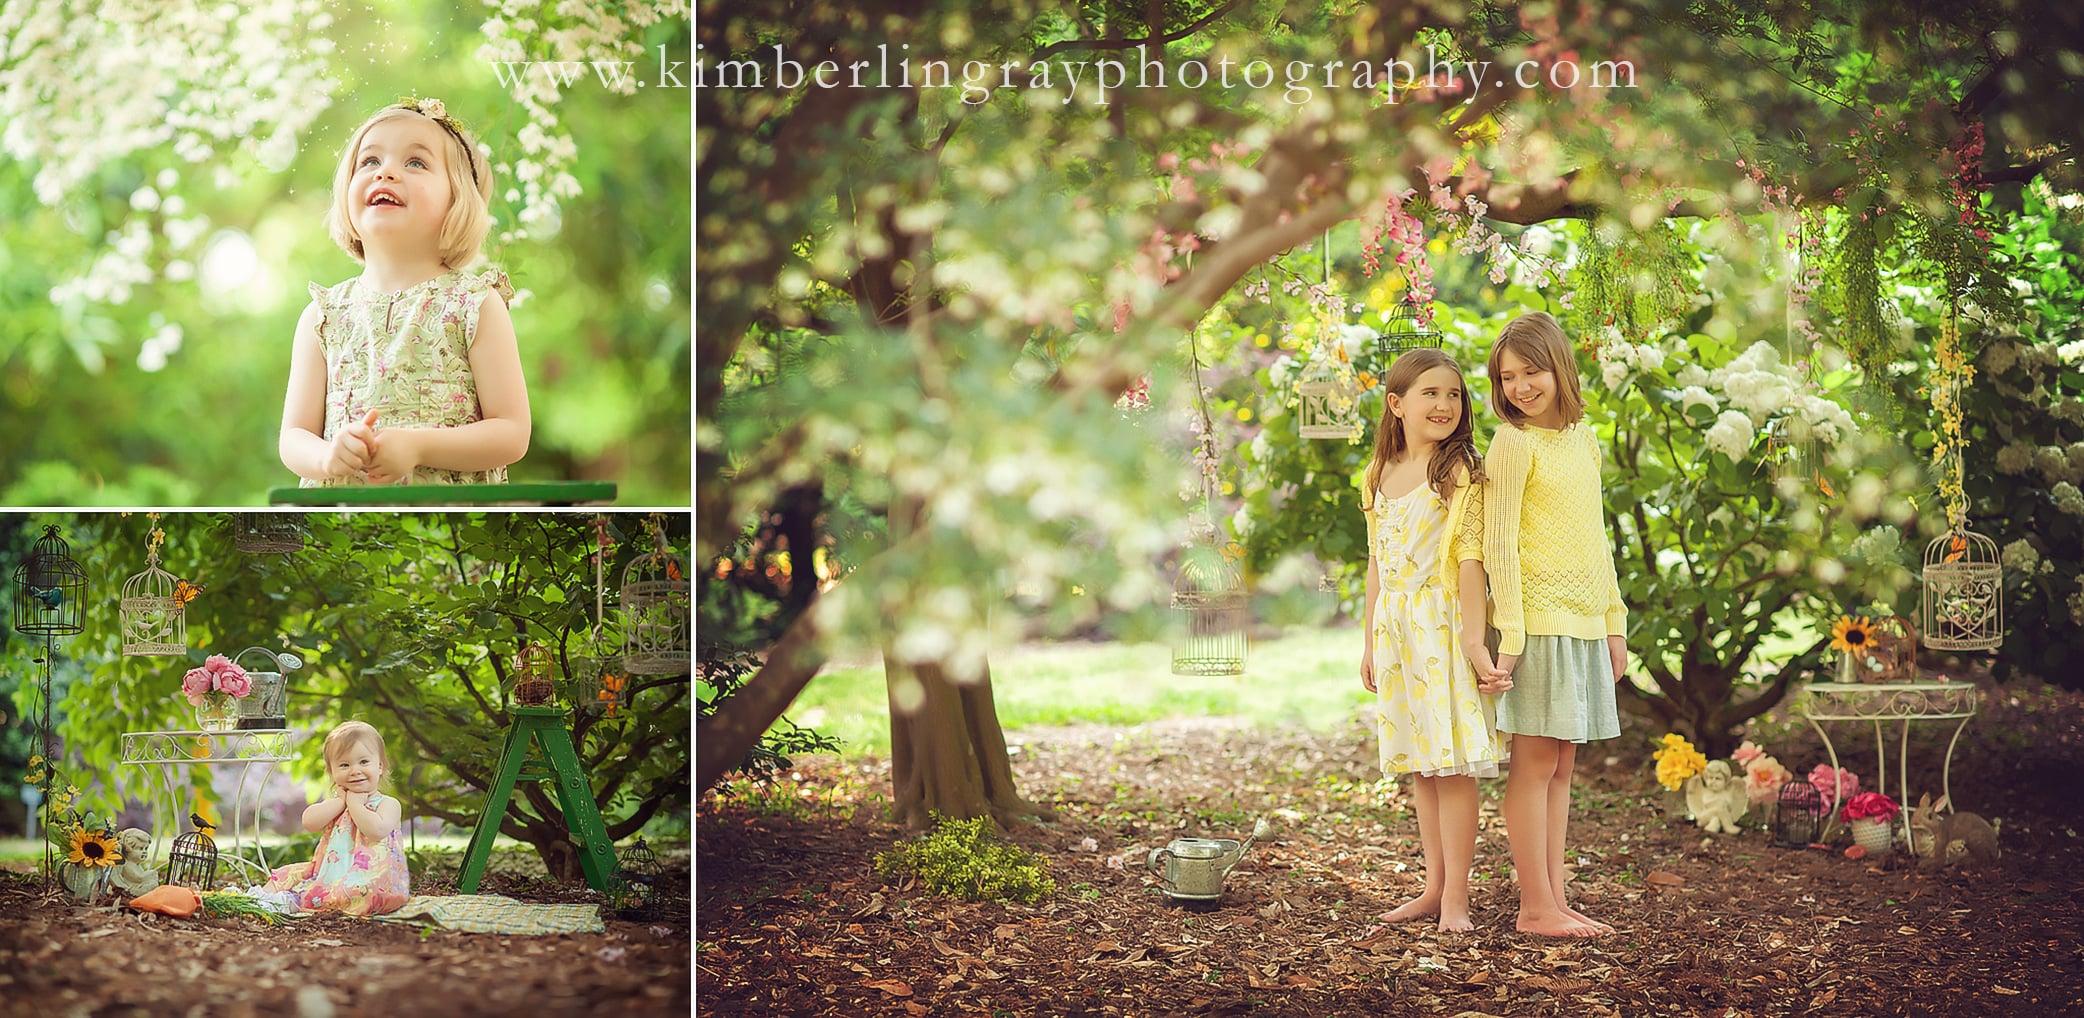 Vintage Garden | Springtime Portraits